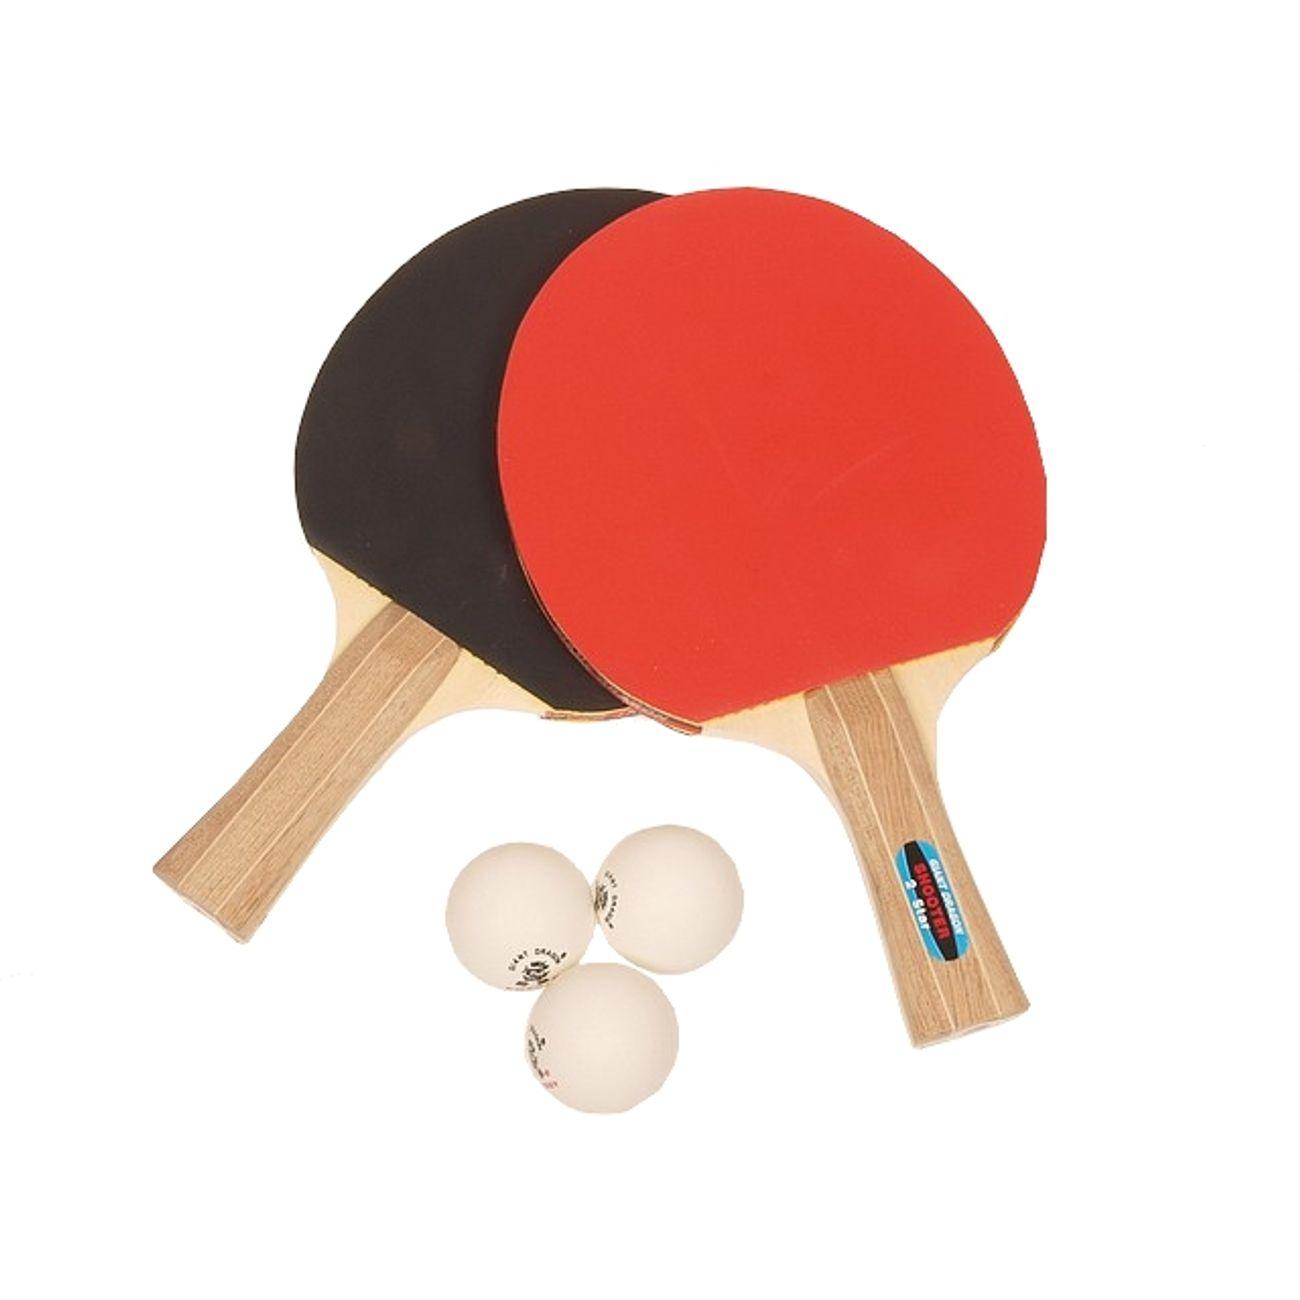 Fine Raquette Tennis De Table Pack 2 Etoiles Shooter Achat Et Interior Design Ideas Helimdqseriescom